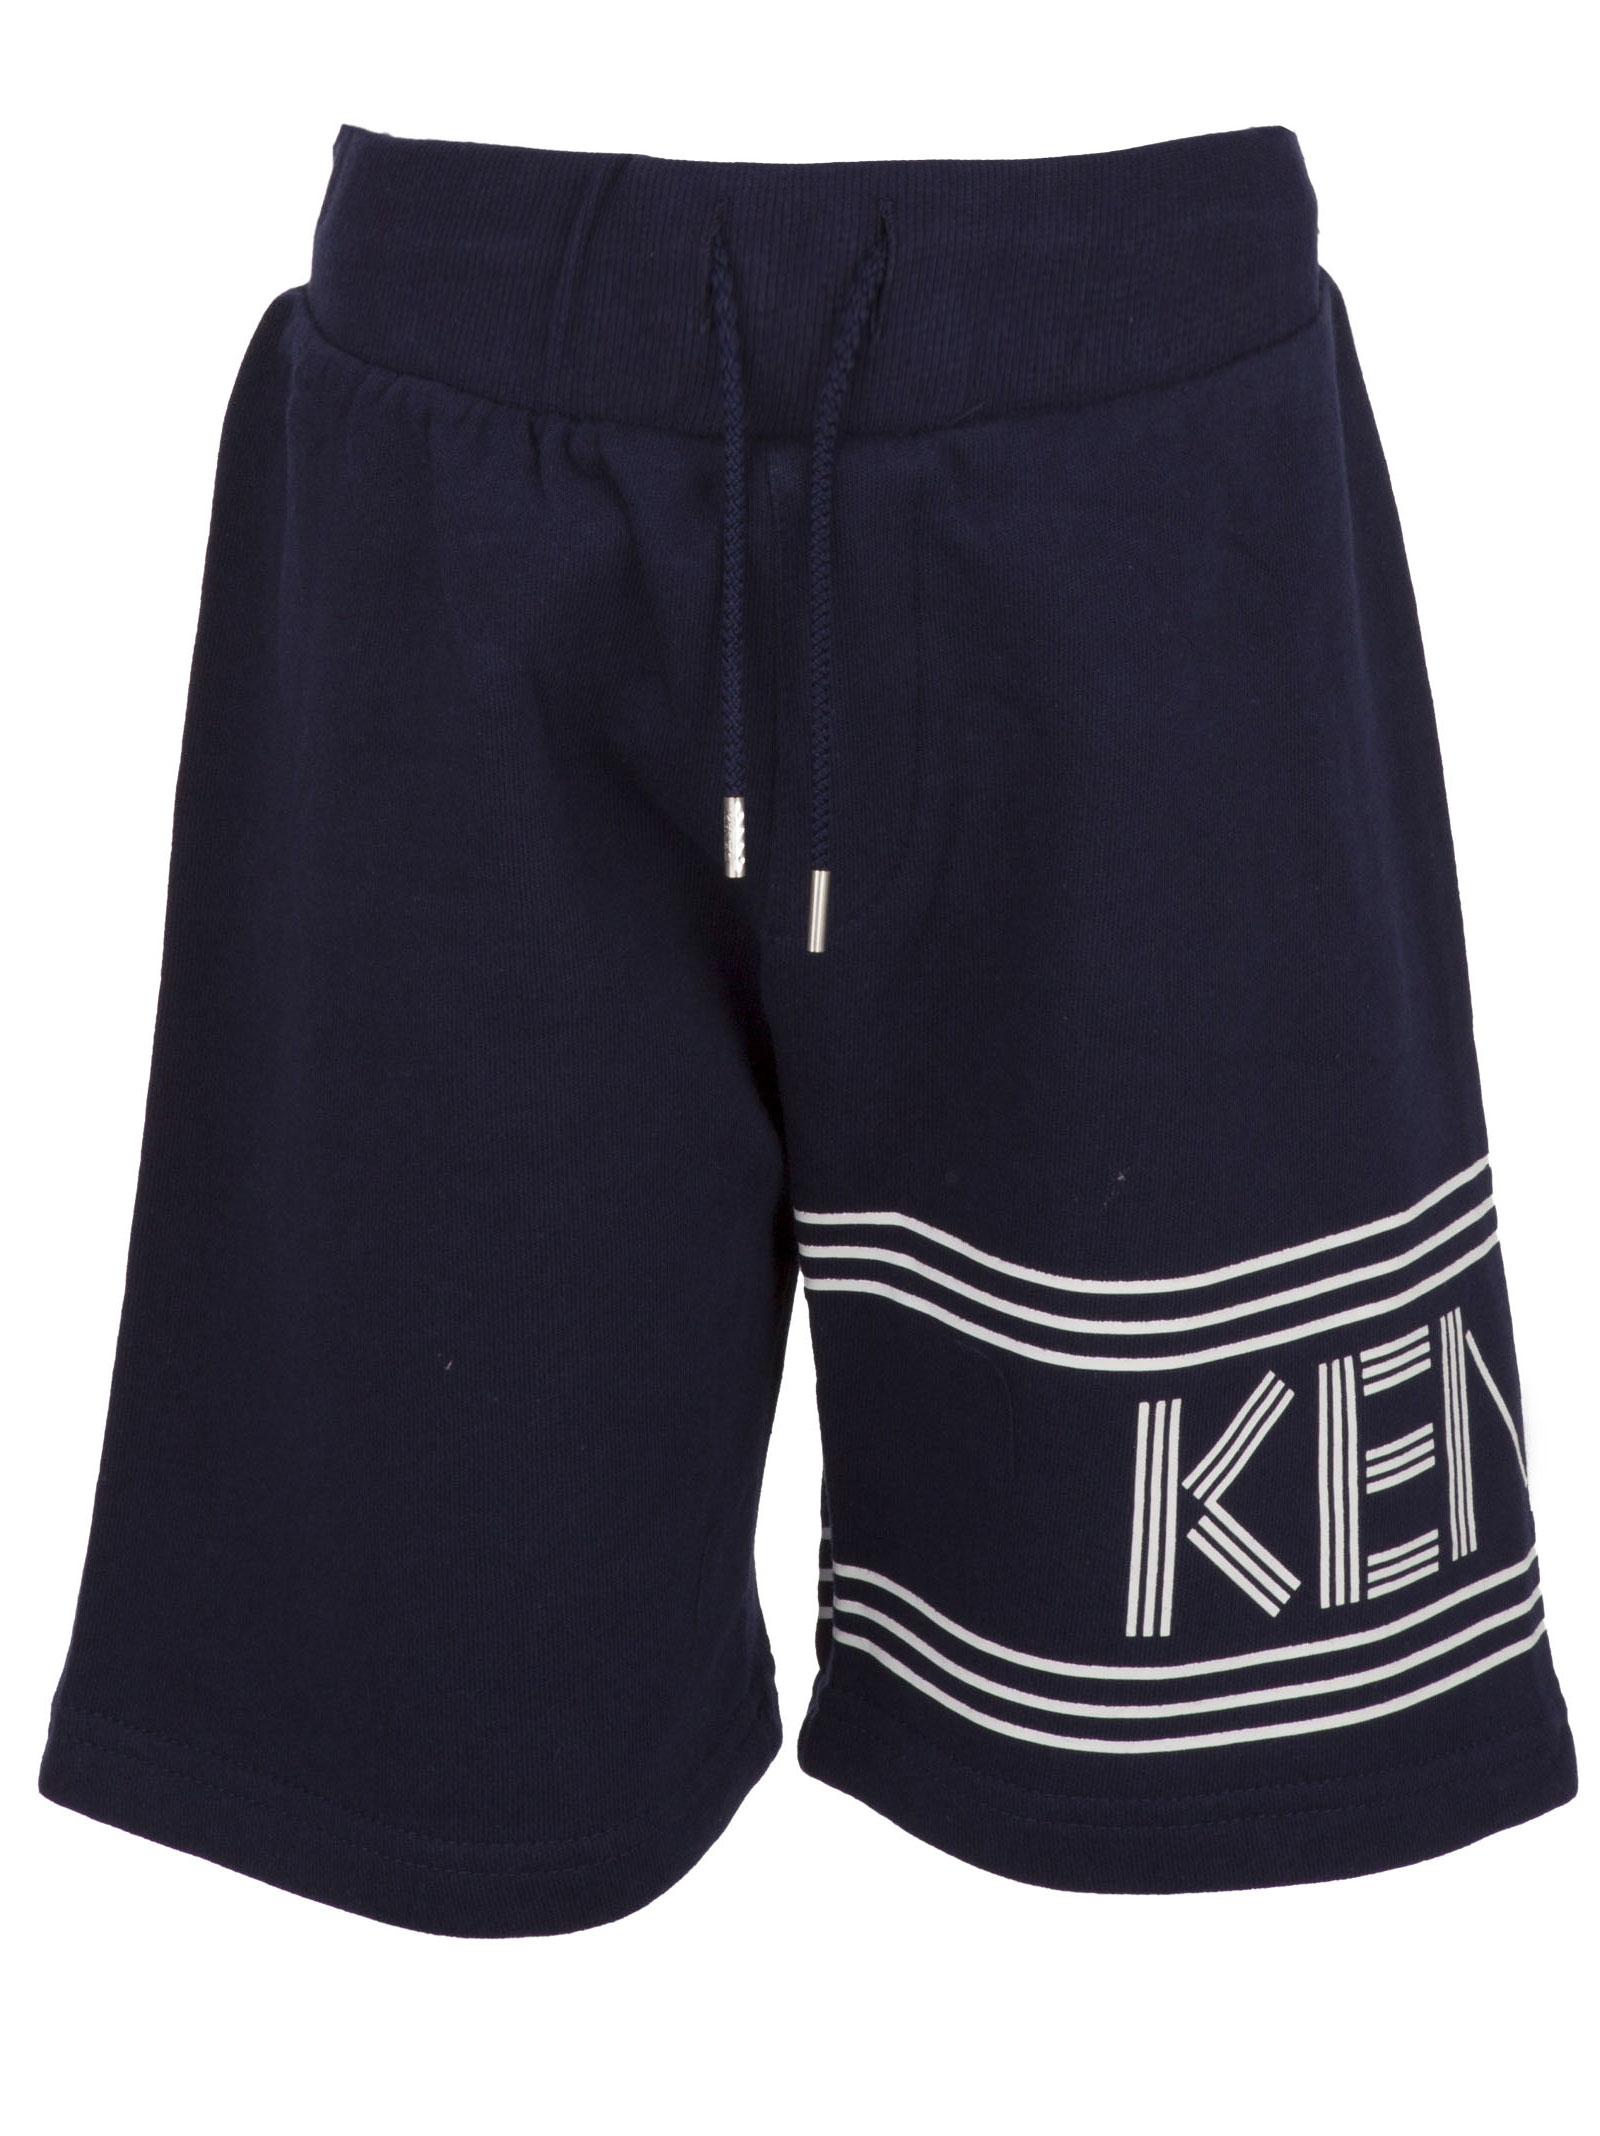 eb2c320cc7b Kenzo Junior shorts - Kenzo Junior - Michele Franzese Moda